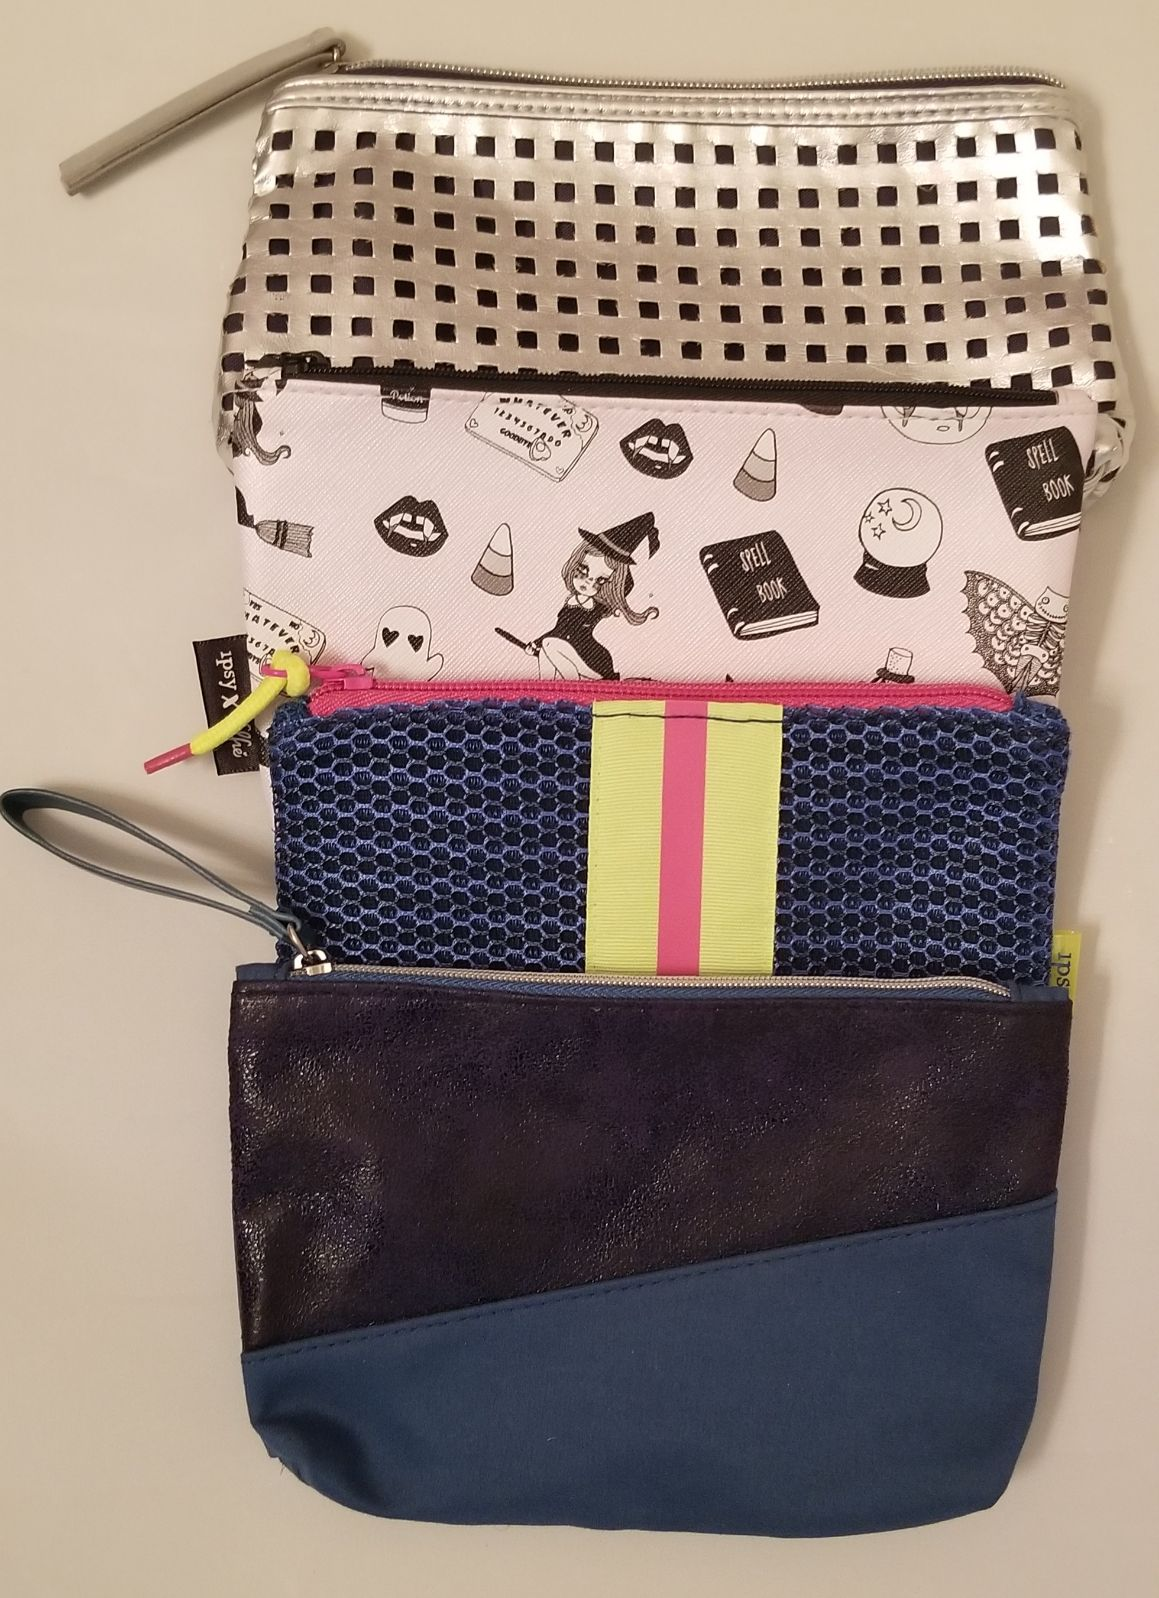 IPSY & ESTEE LAUDER Cosmetic Bag Lot